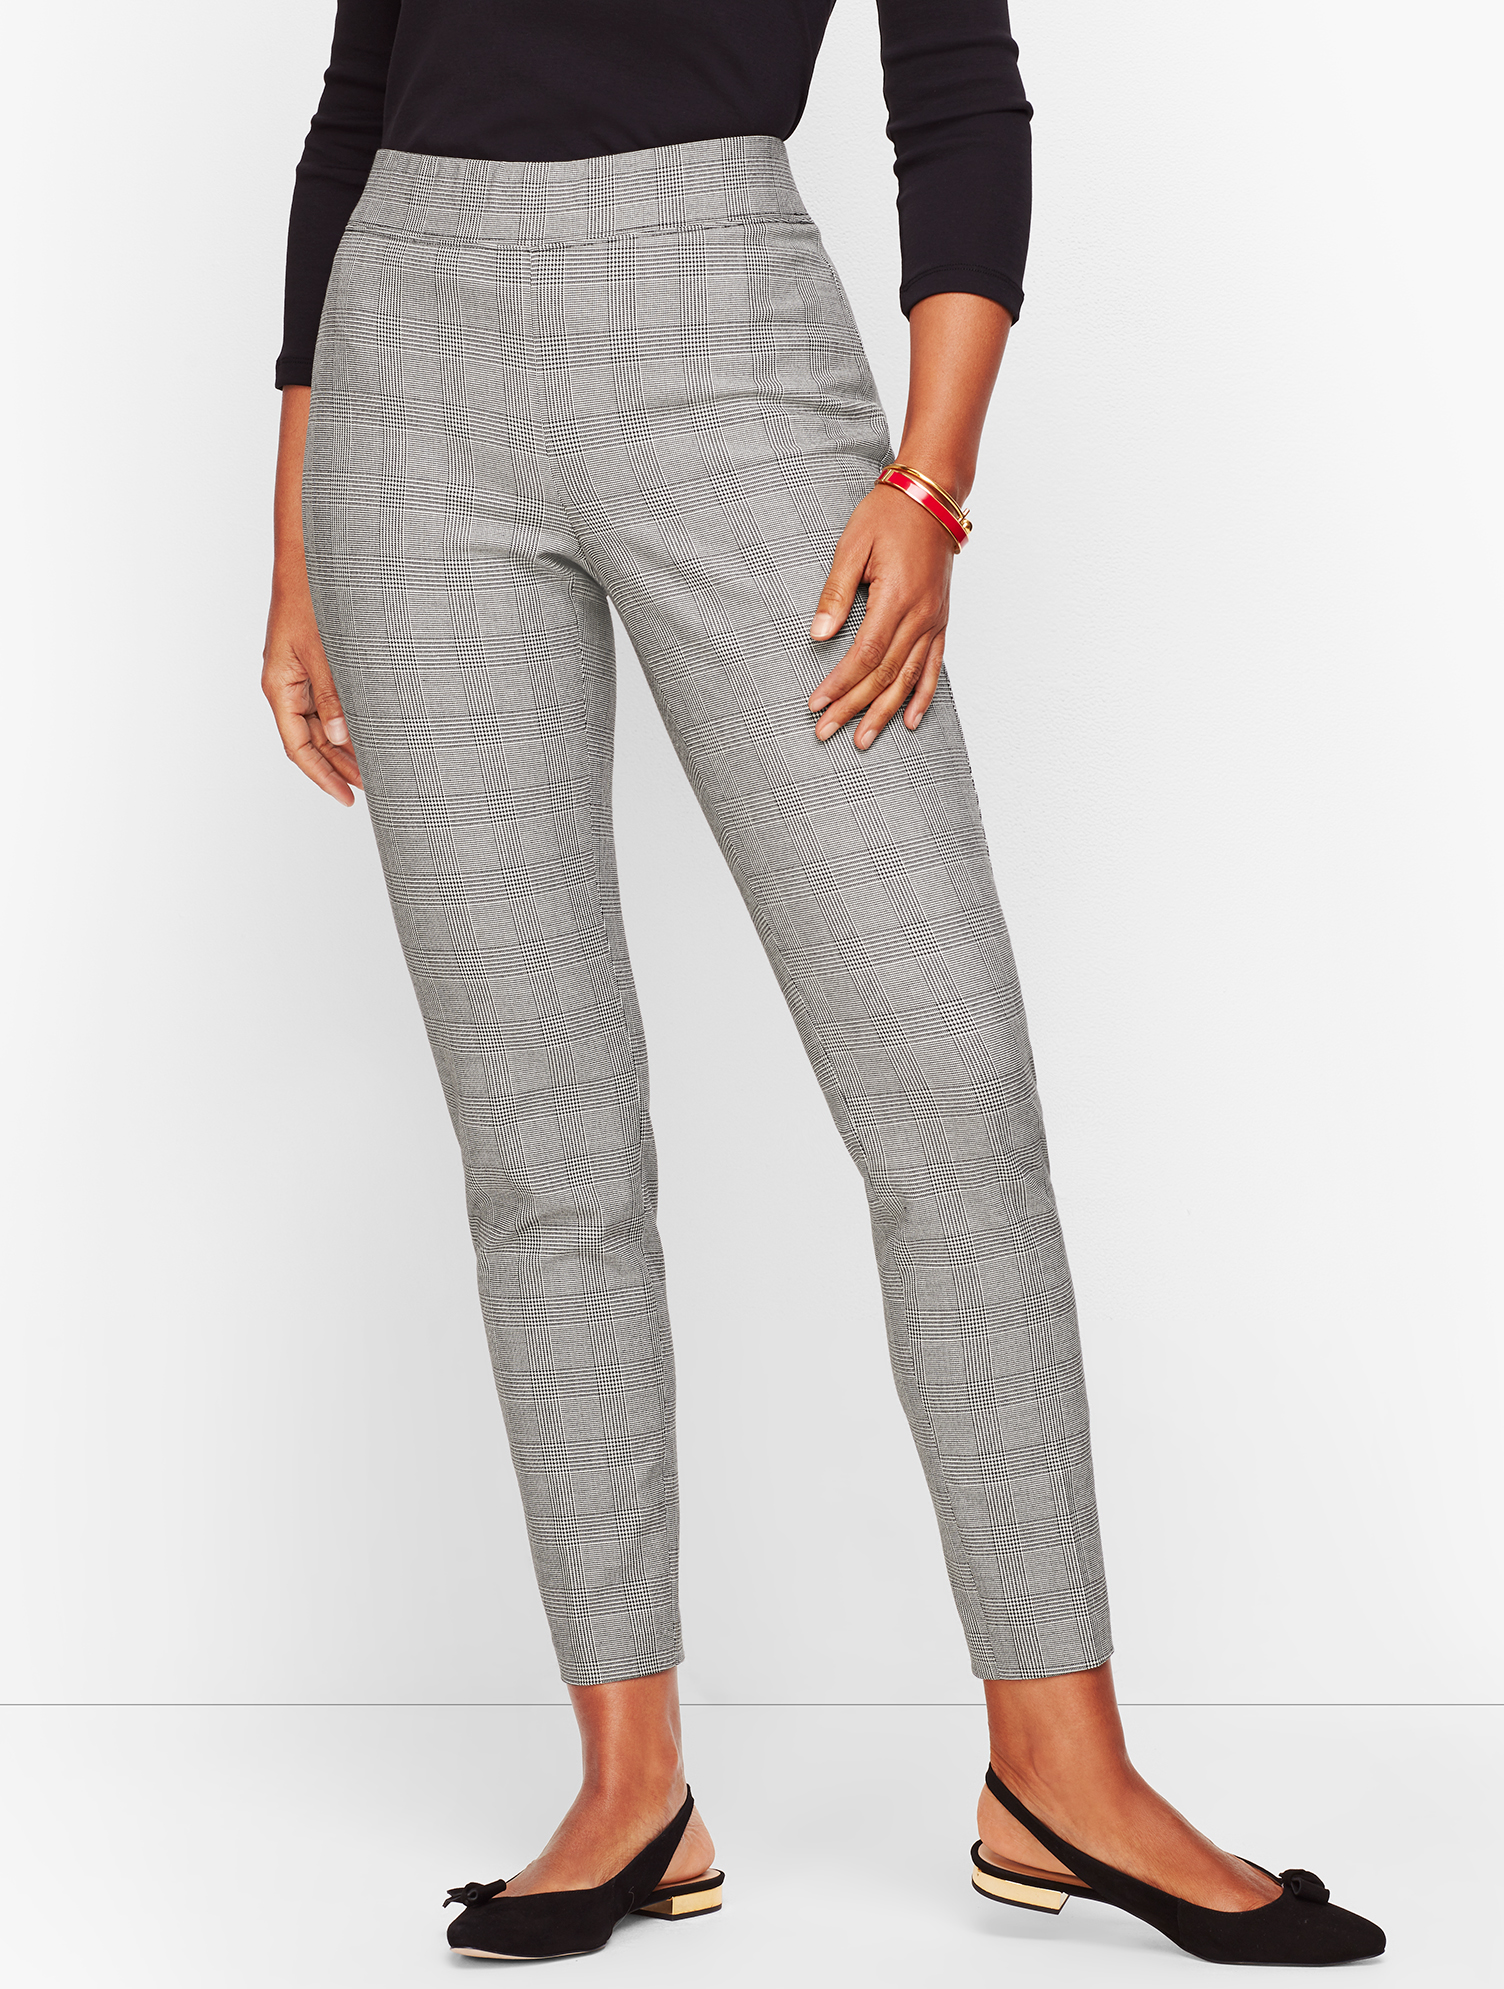 Vintage High Waisted Trousers, Sailor Pants, Jeans Talbots Essex Ankle Pants - Curvy Fit - Glen Plaid - IvoryBlack - 16 $89.99 AT vintagedancer.com